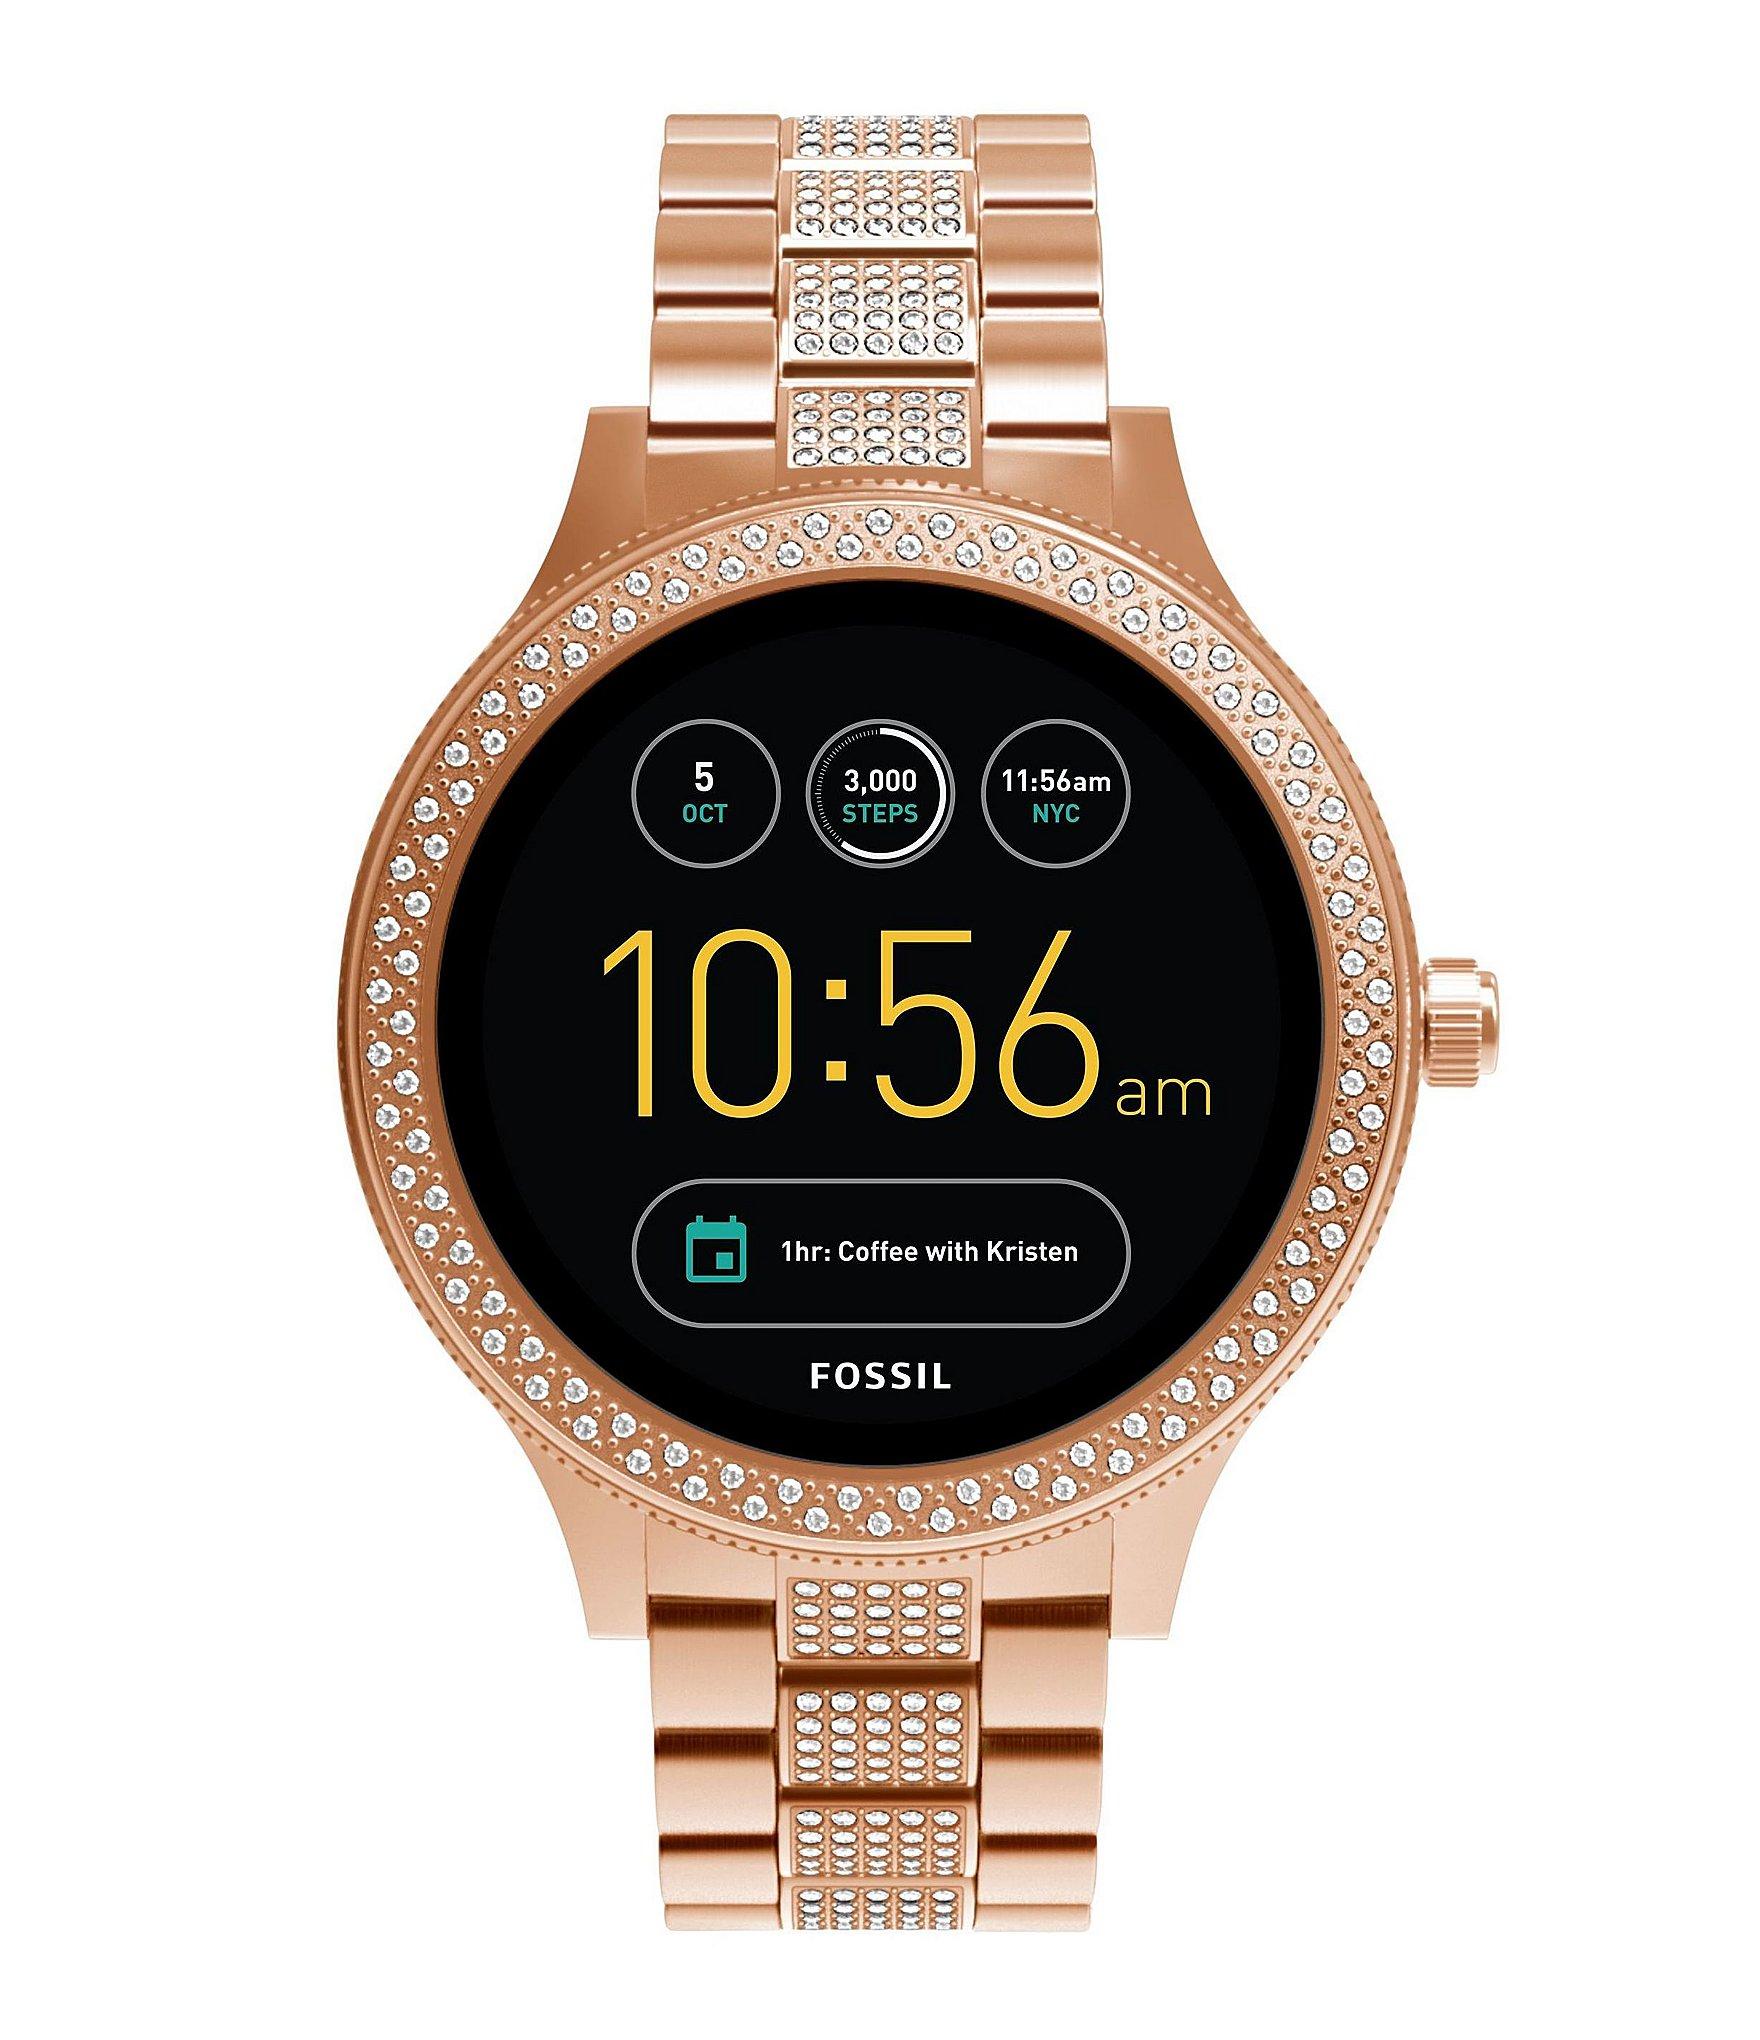 fossil q venture gen 3 pav bracelet smart watch dillards. Black Bedroom Furniture Sets. Home Design Ideas